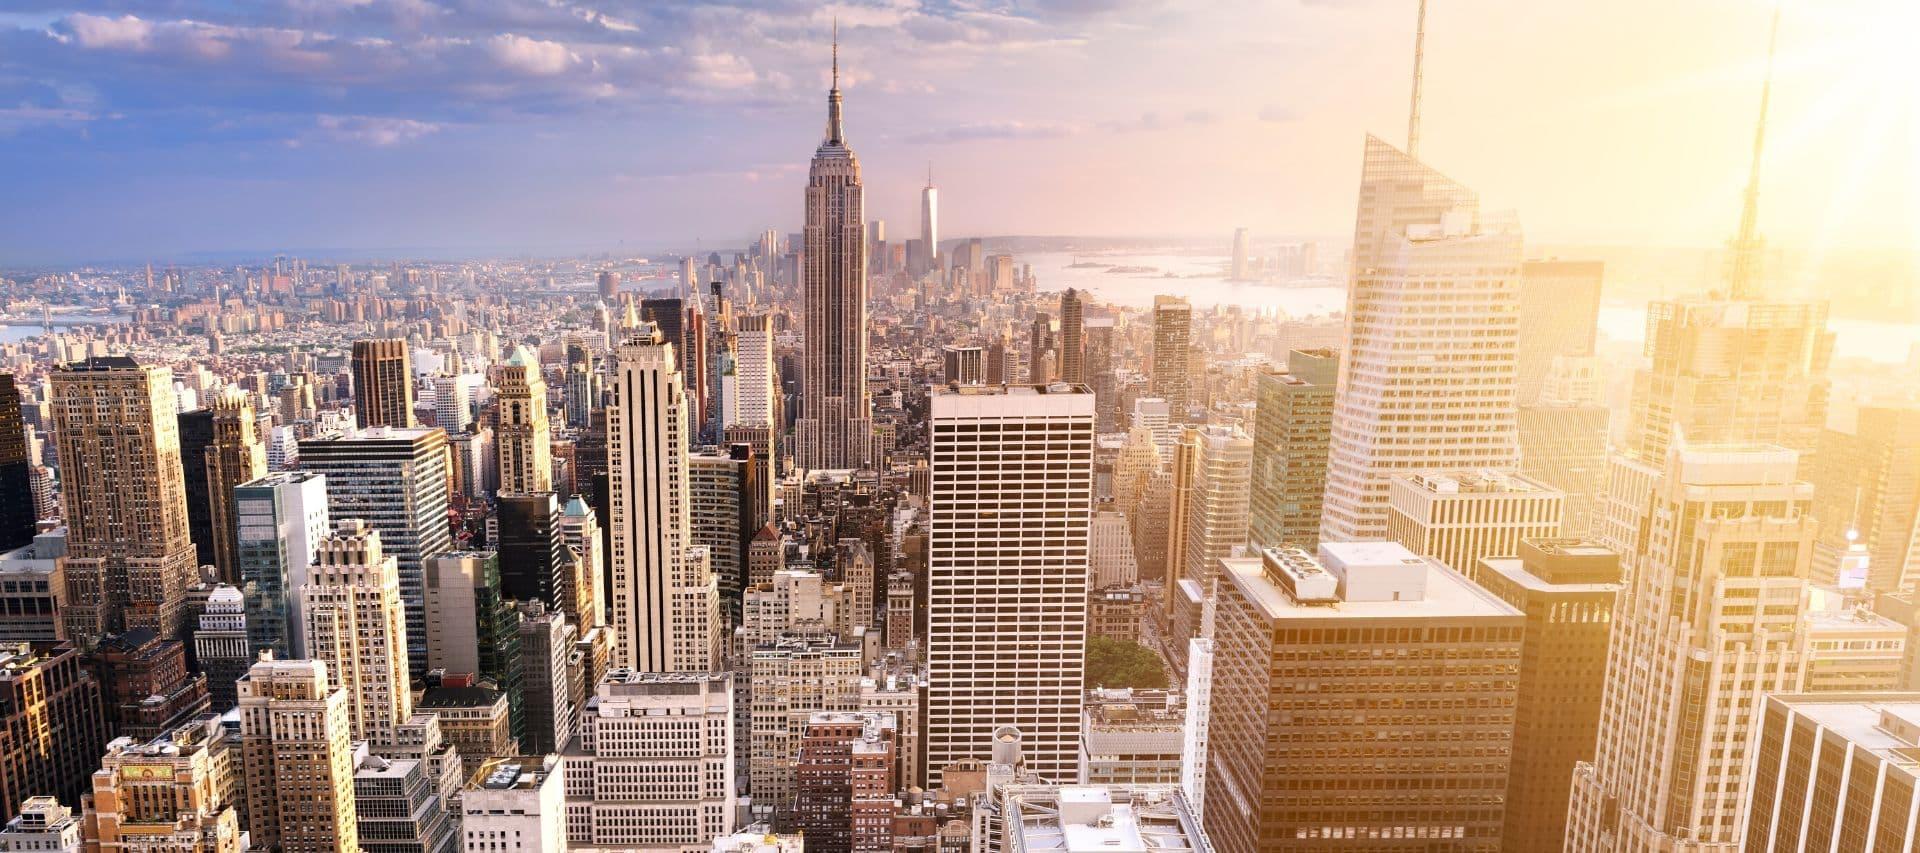 Cityscape of Manhattan, New York